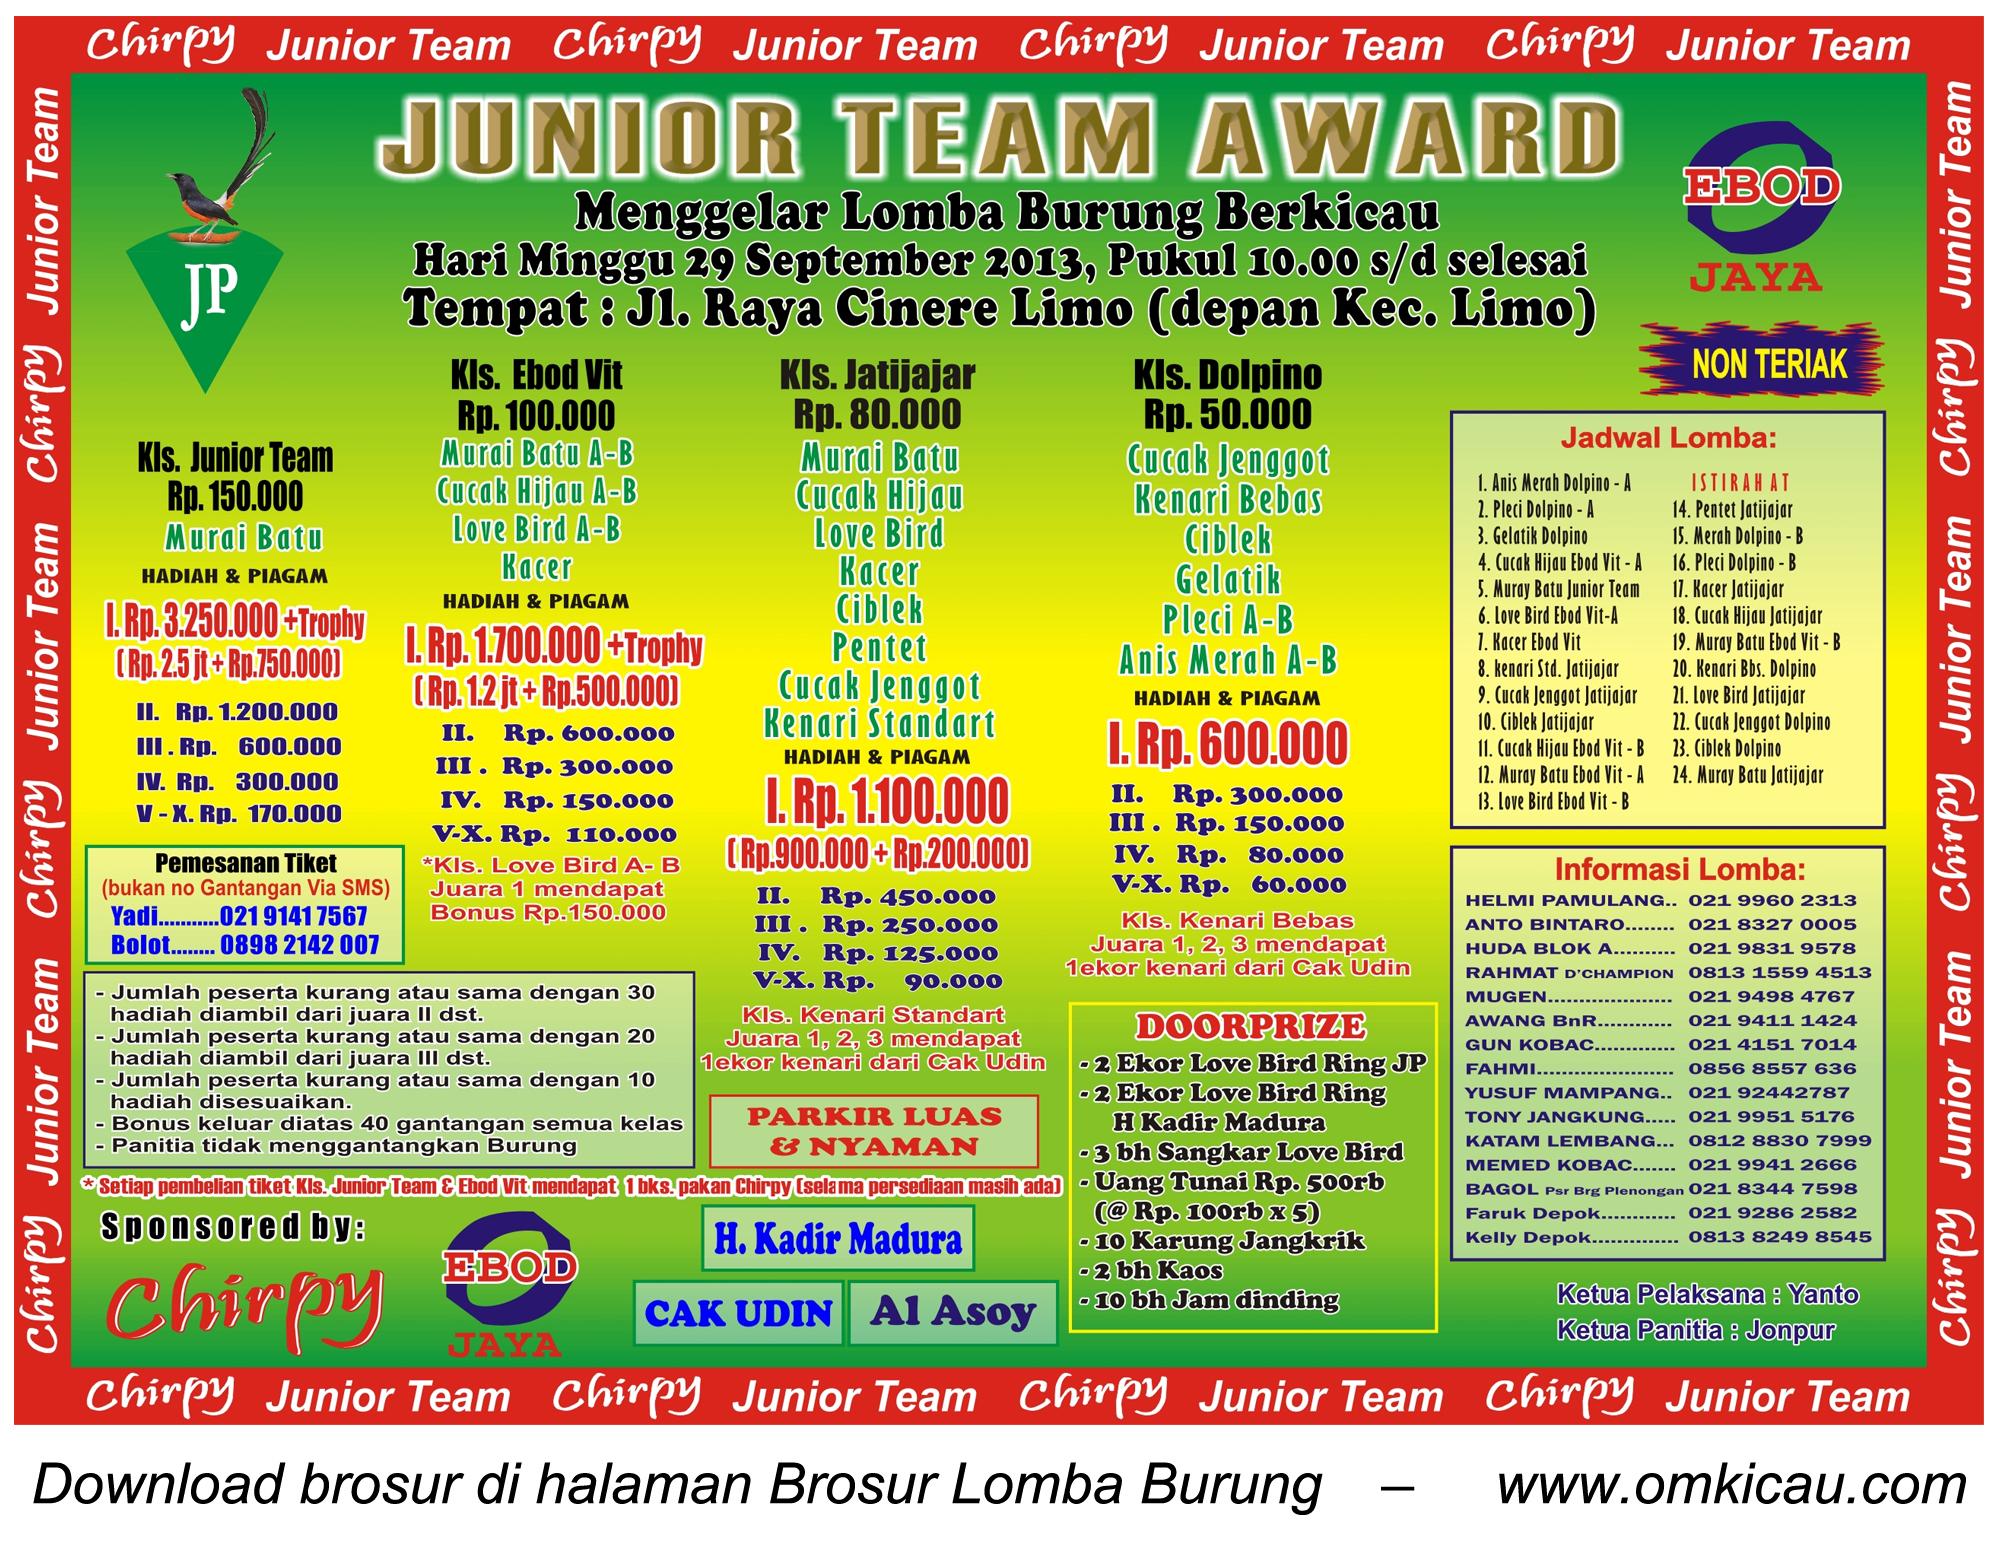 Brosur Lomba Burung Junior Team Award - Depok - 29 Sept 2013